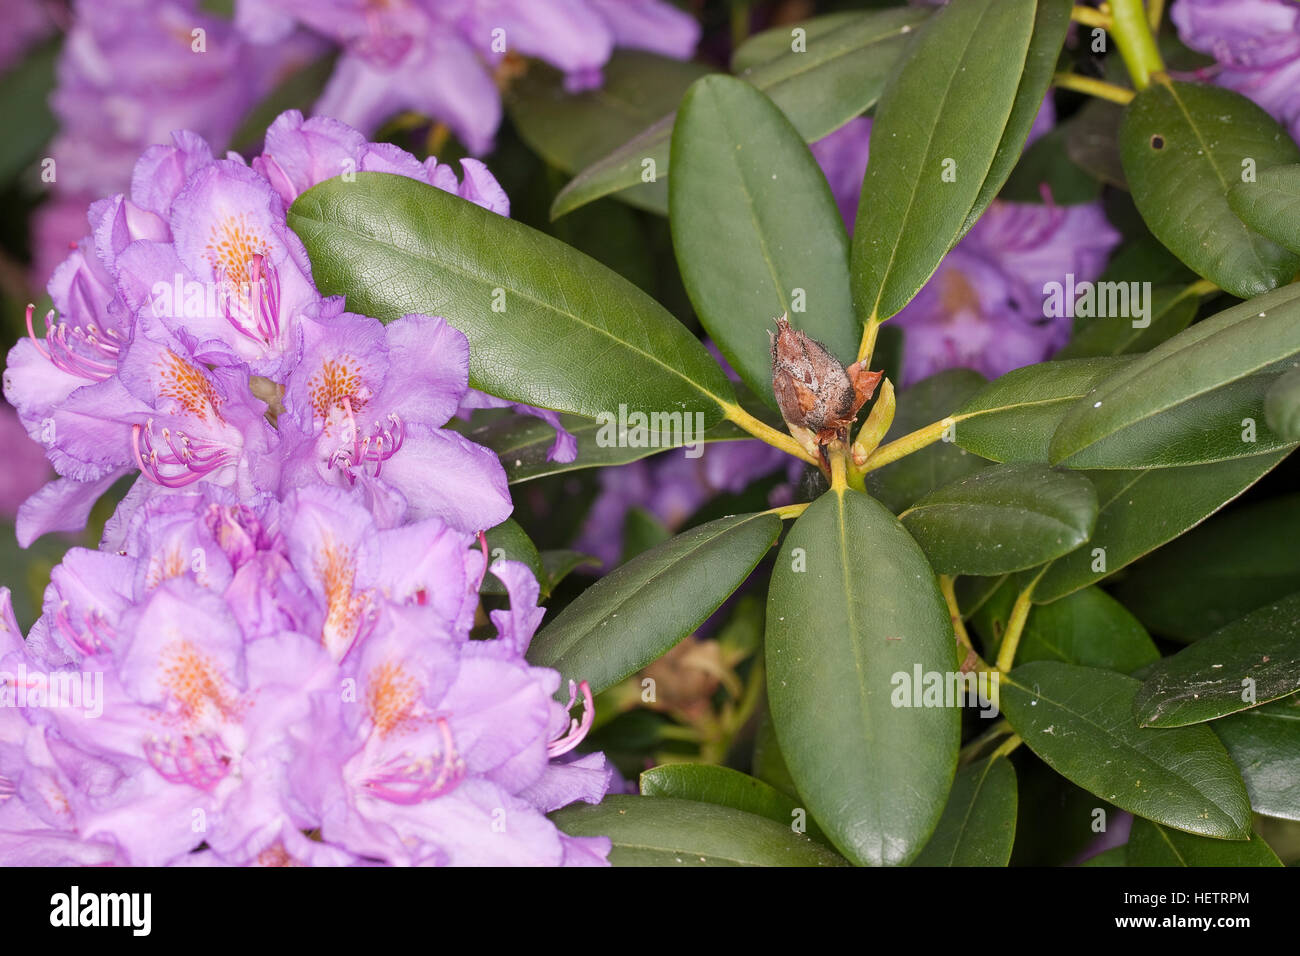 Rhododendron-Knospenfäule, Knospenfäule, vertrocknete Knospe, Knospen an Rhododendron, Zierstrauch im - Stock Image